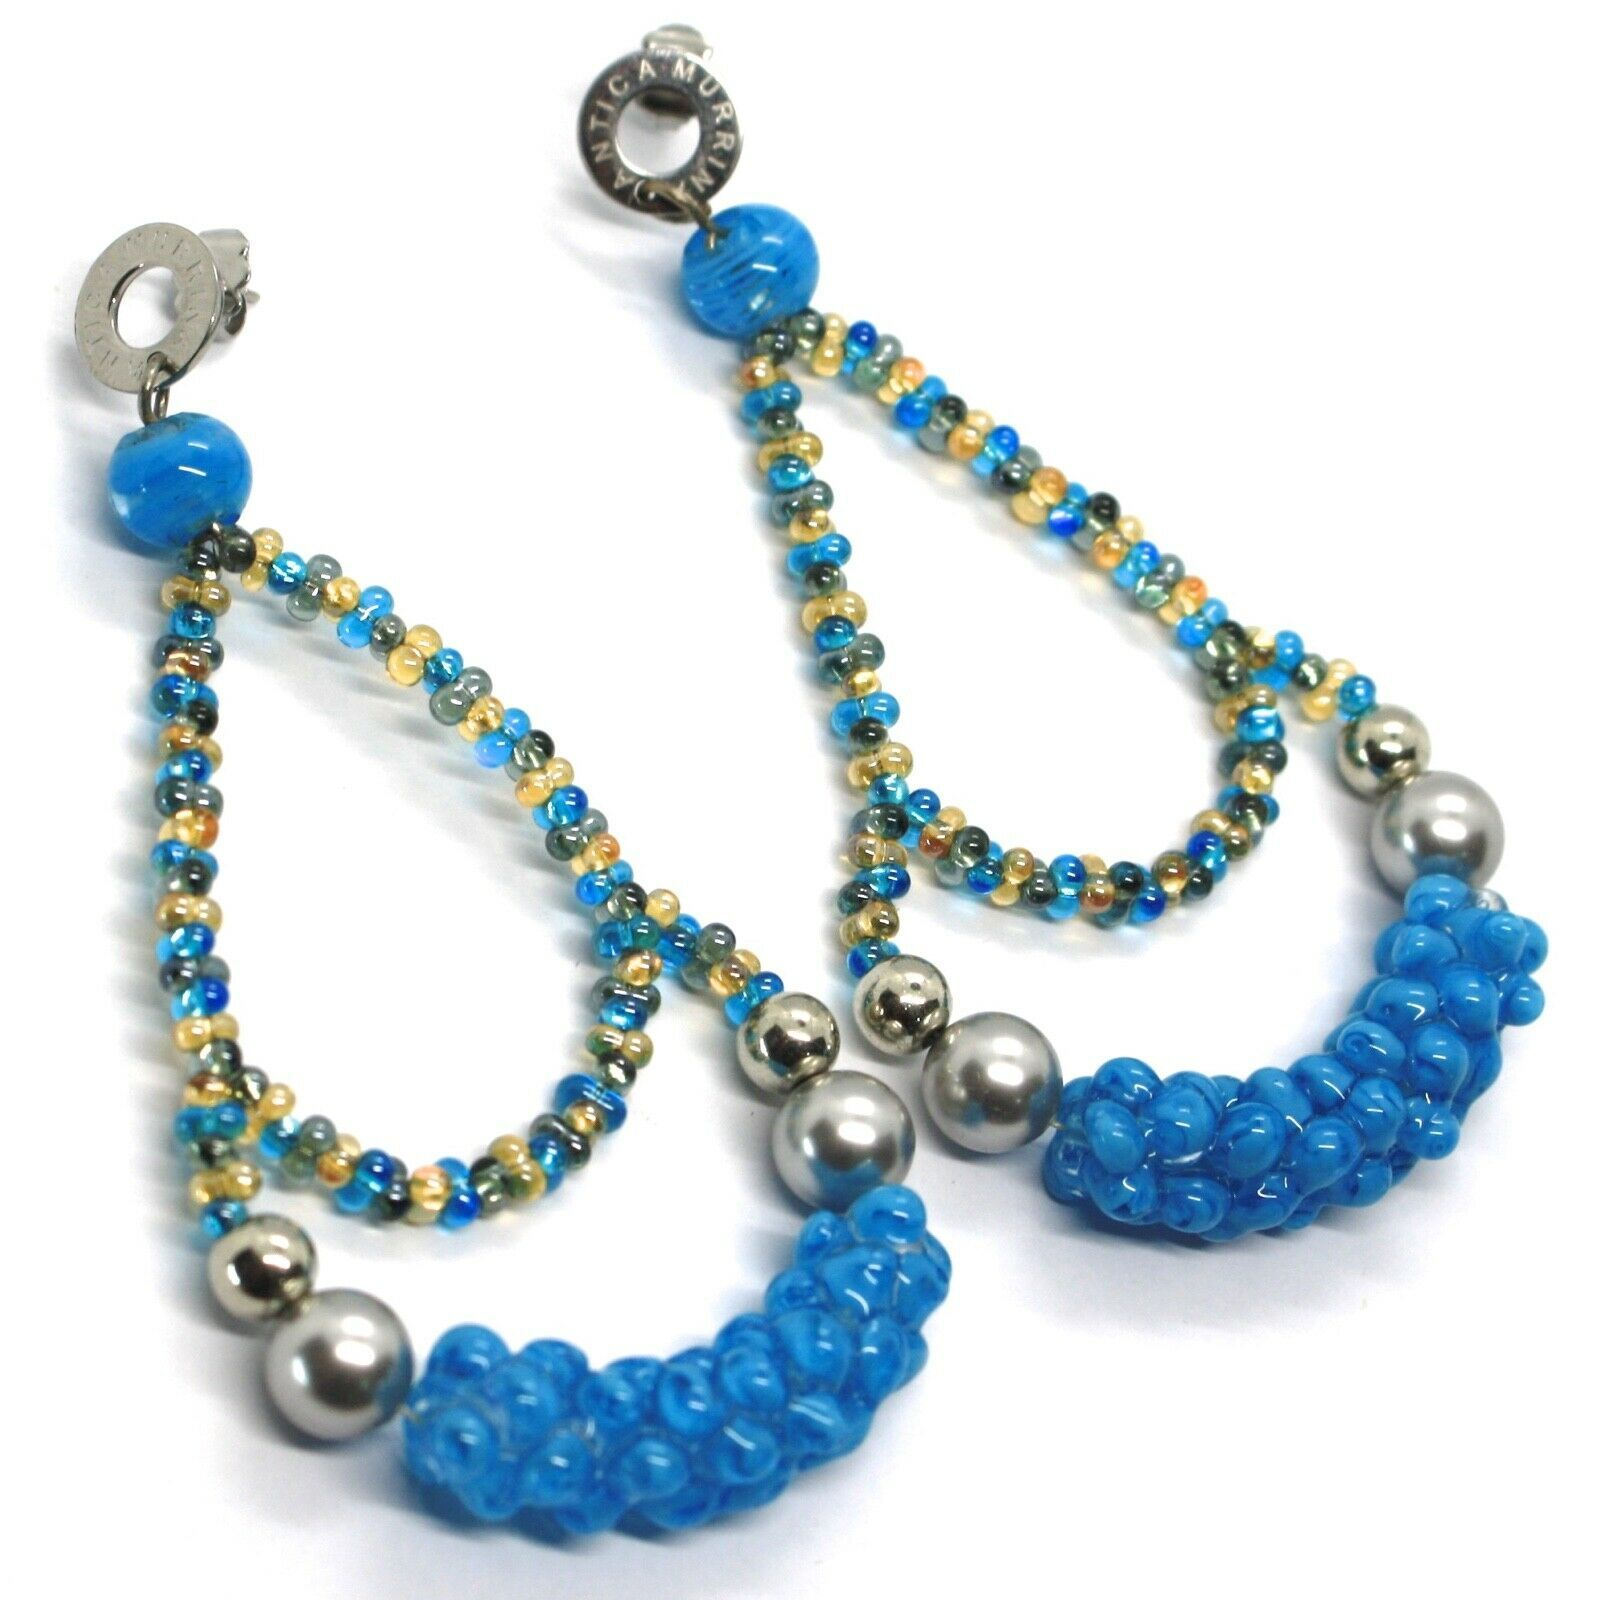 Earrings Antica Murrina Venezia, Hanging, Double Drop Big Blue, 8.5 CM